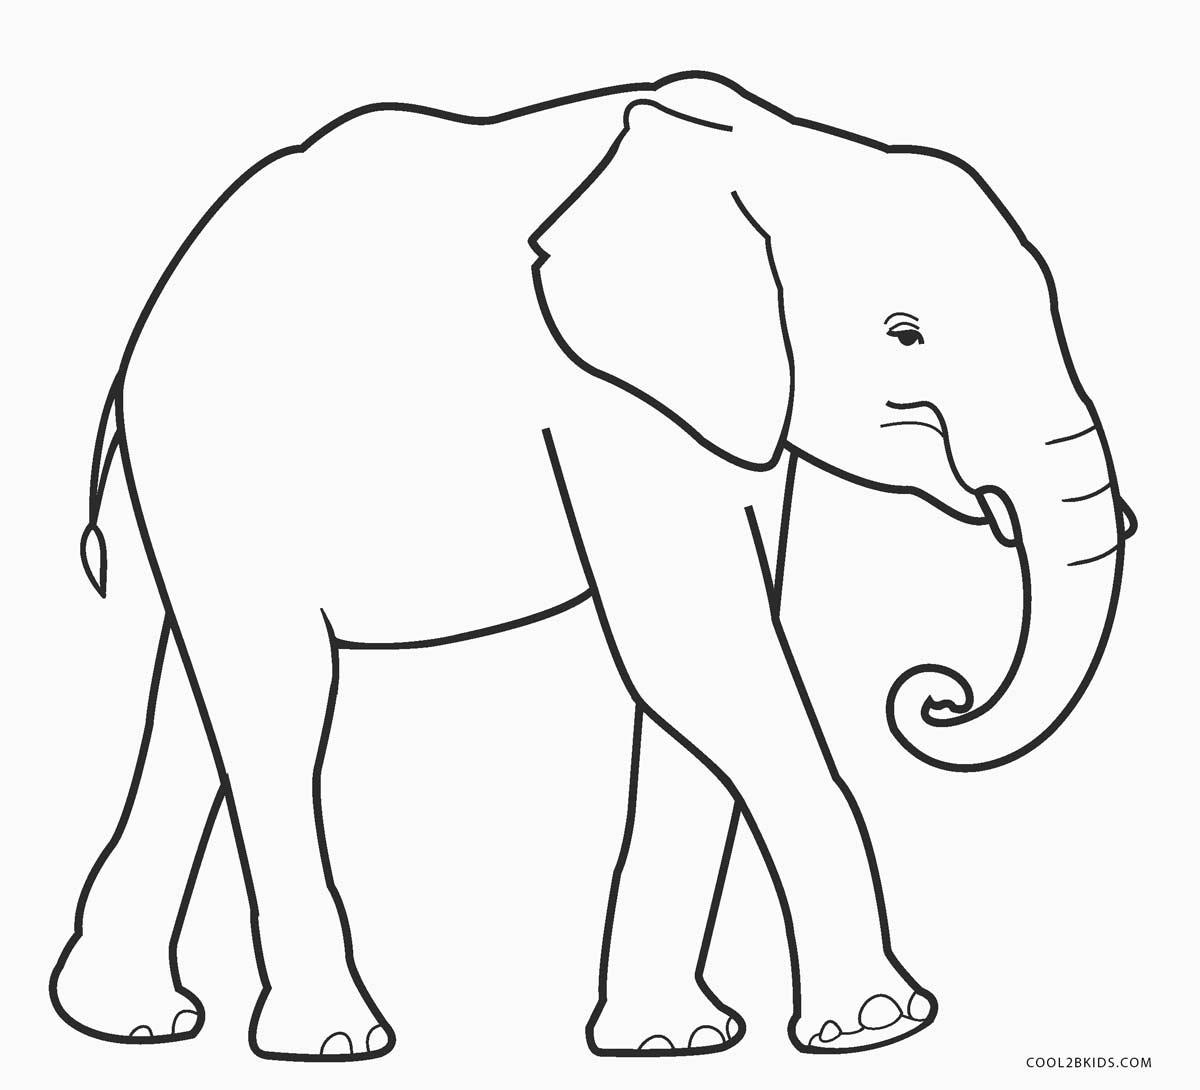 Dibujos De Elefantes Para Colorear Páginas Para Imprimir